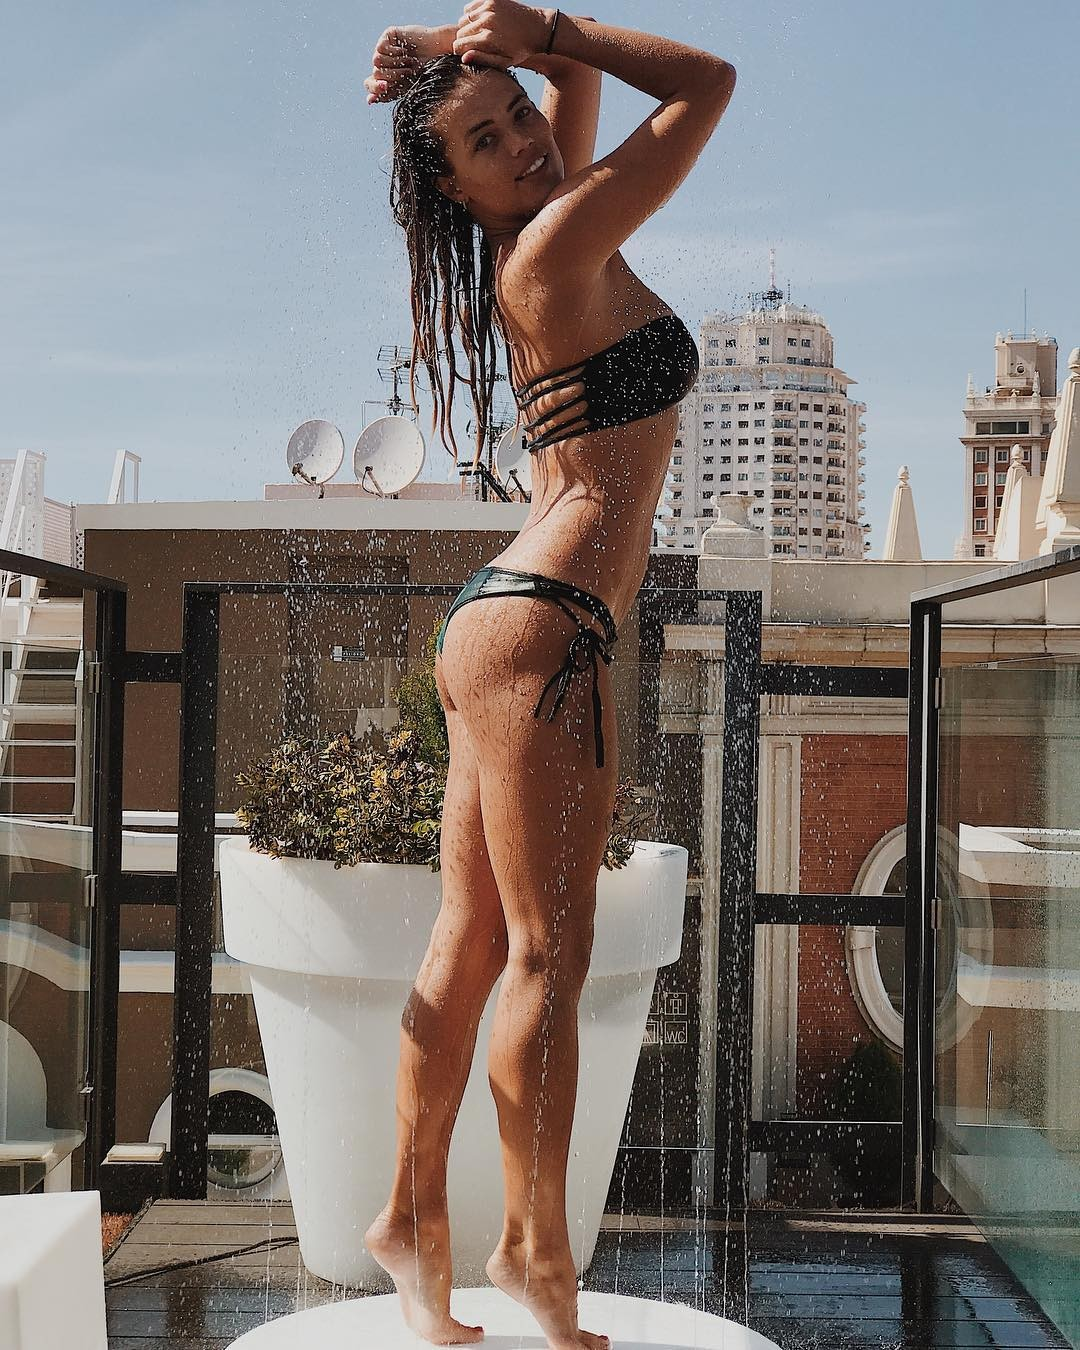 Alyson Eckmann Nude alyson eckmann nude, naked - pics and videos - imperiodefamosas